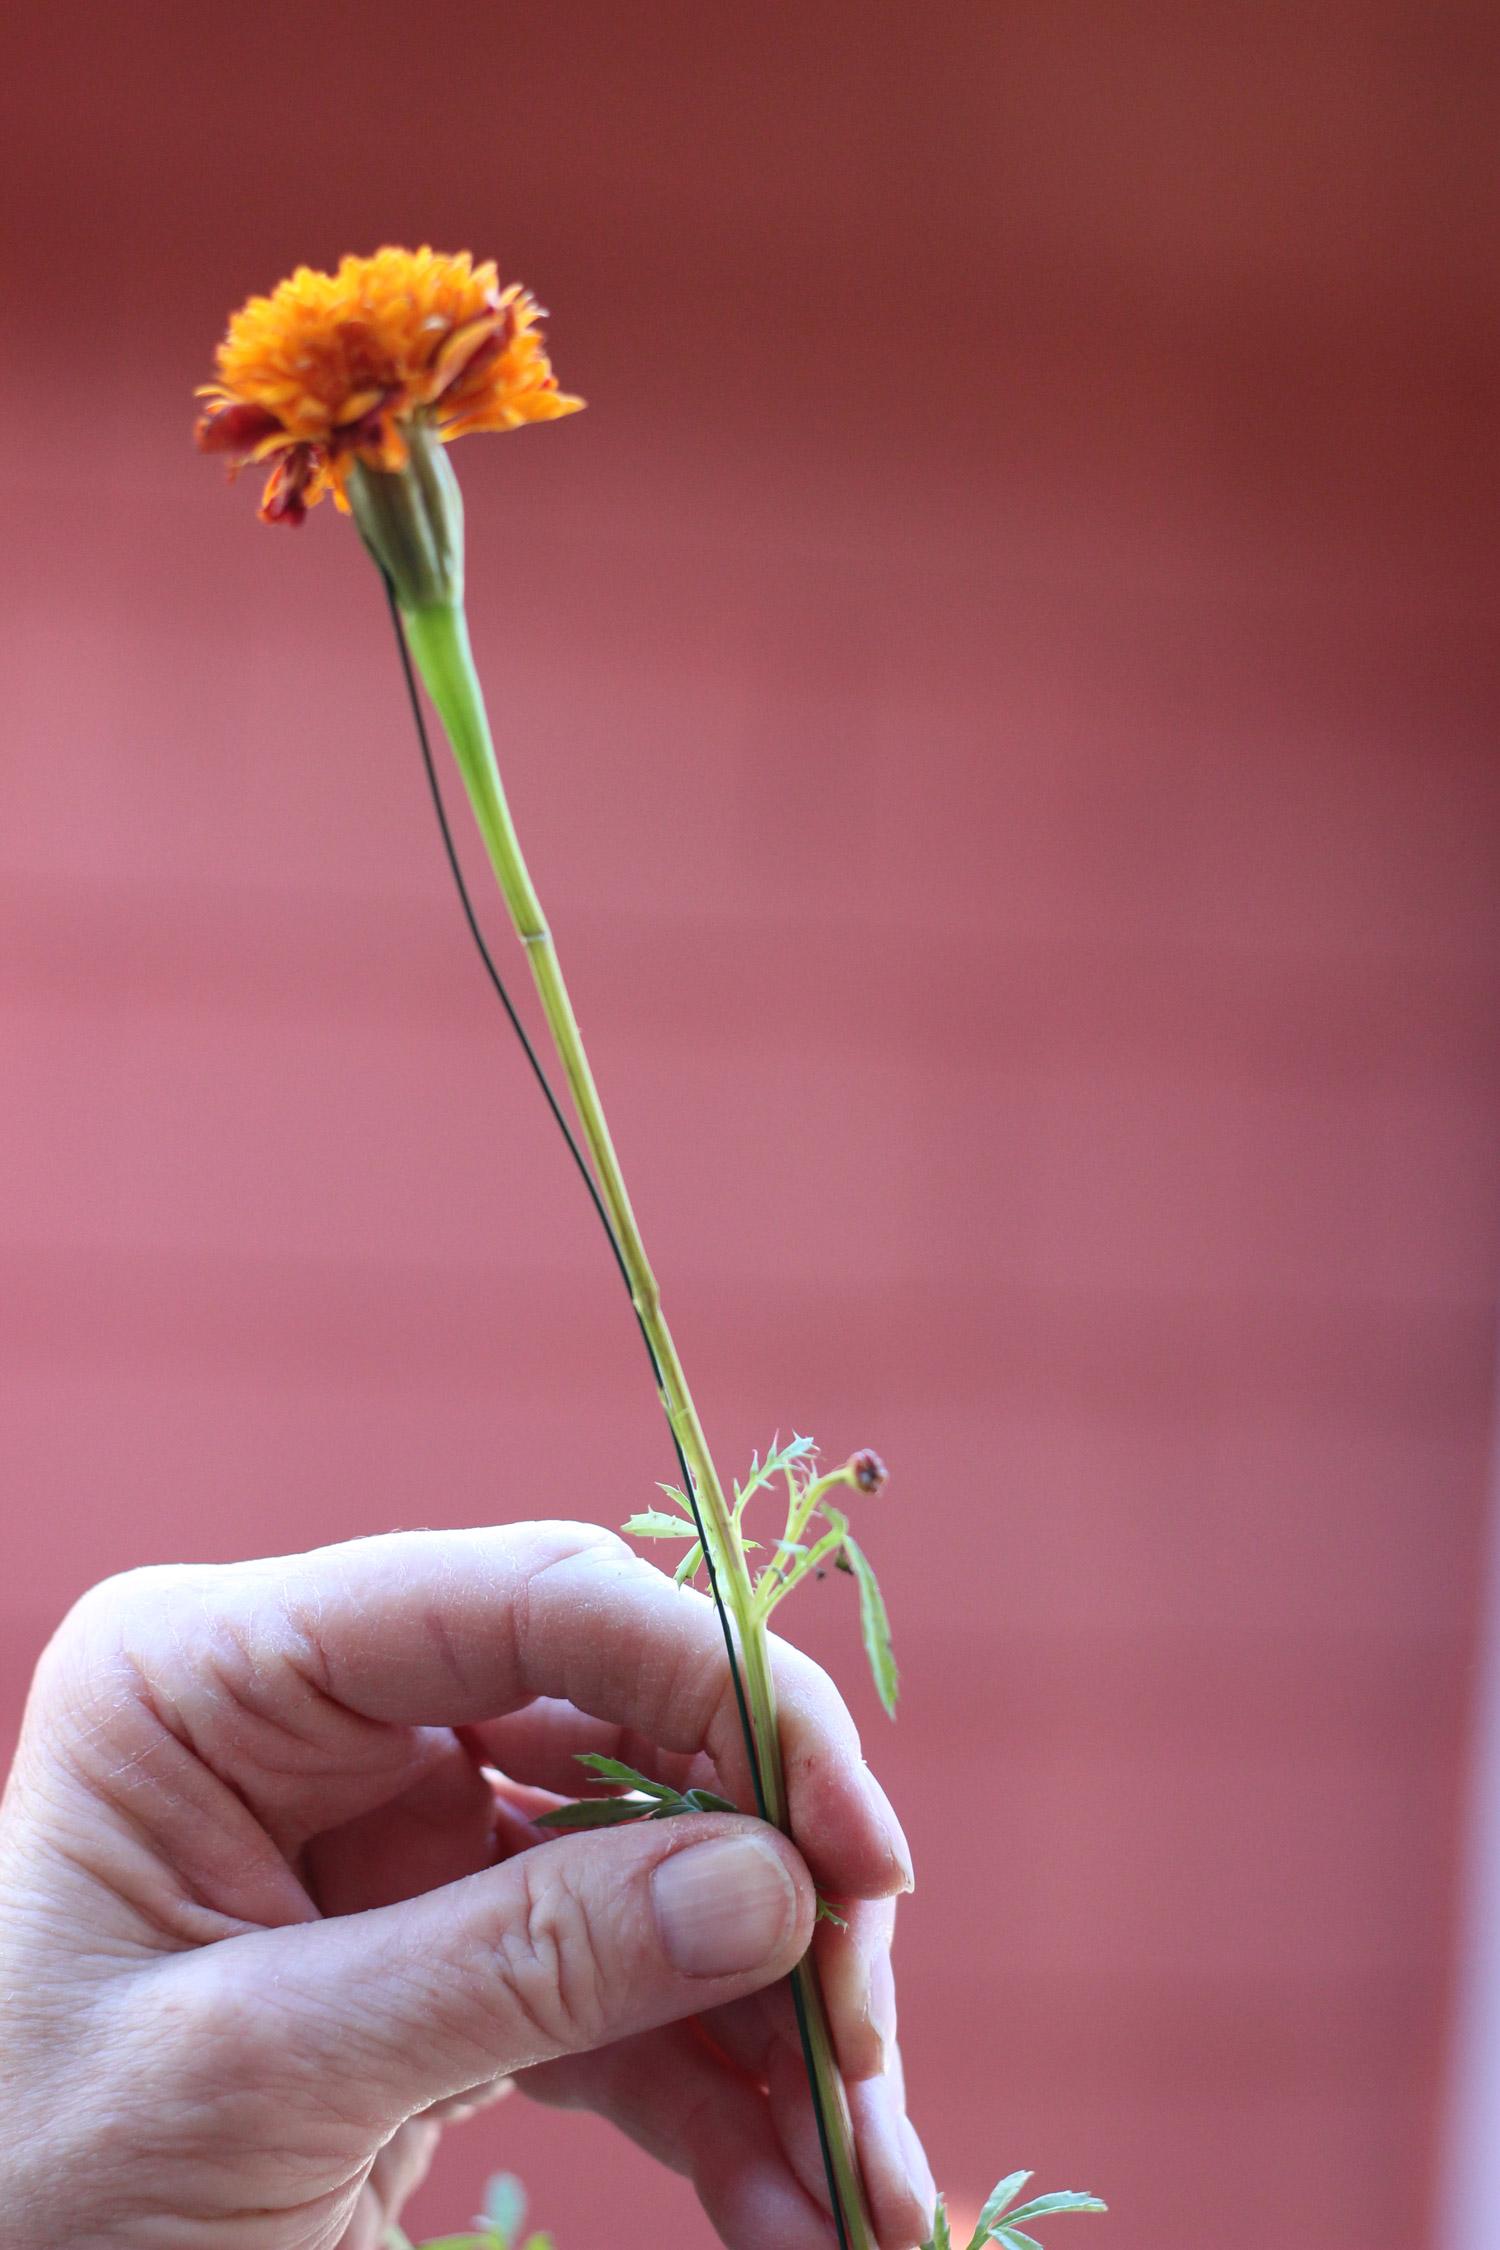 Bring wire down past bend, then wrap around stem.